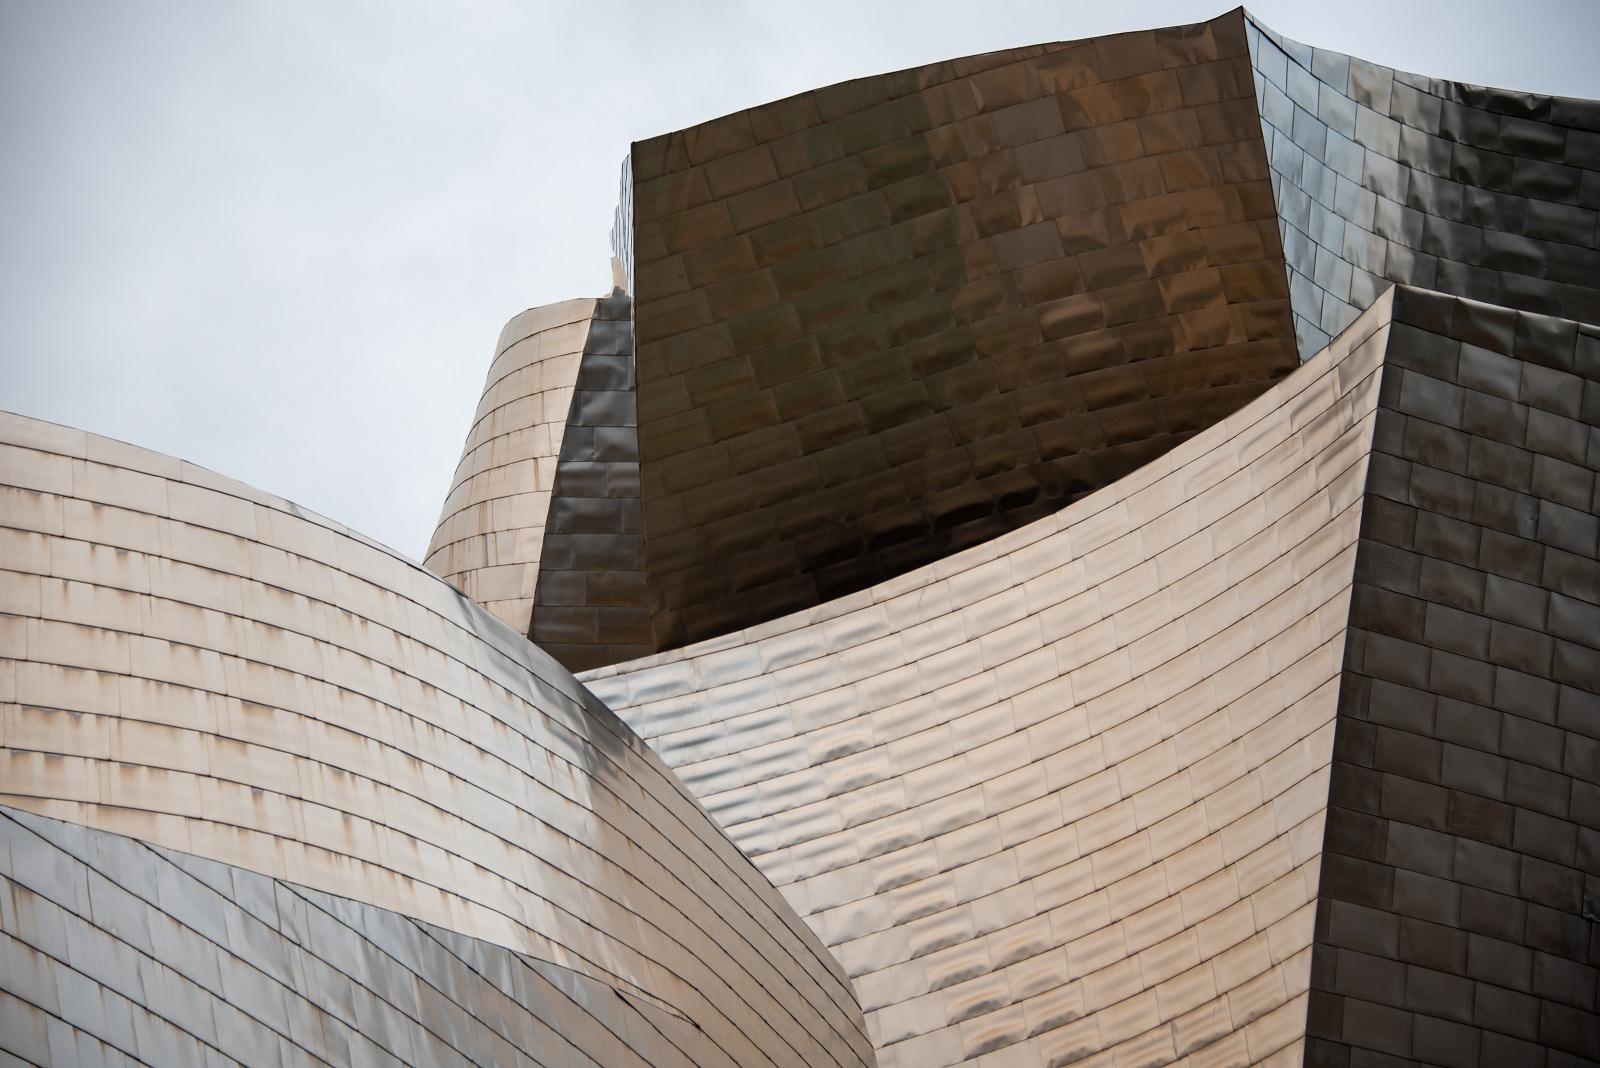 Bilbao, 2012